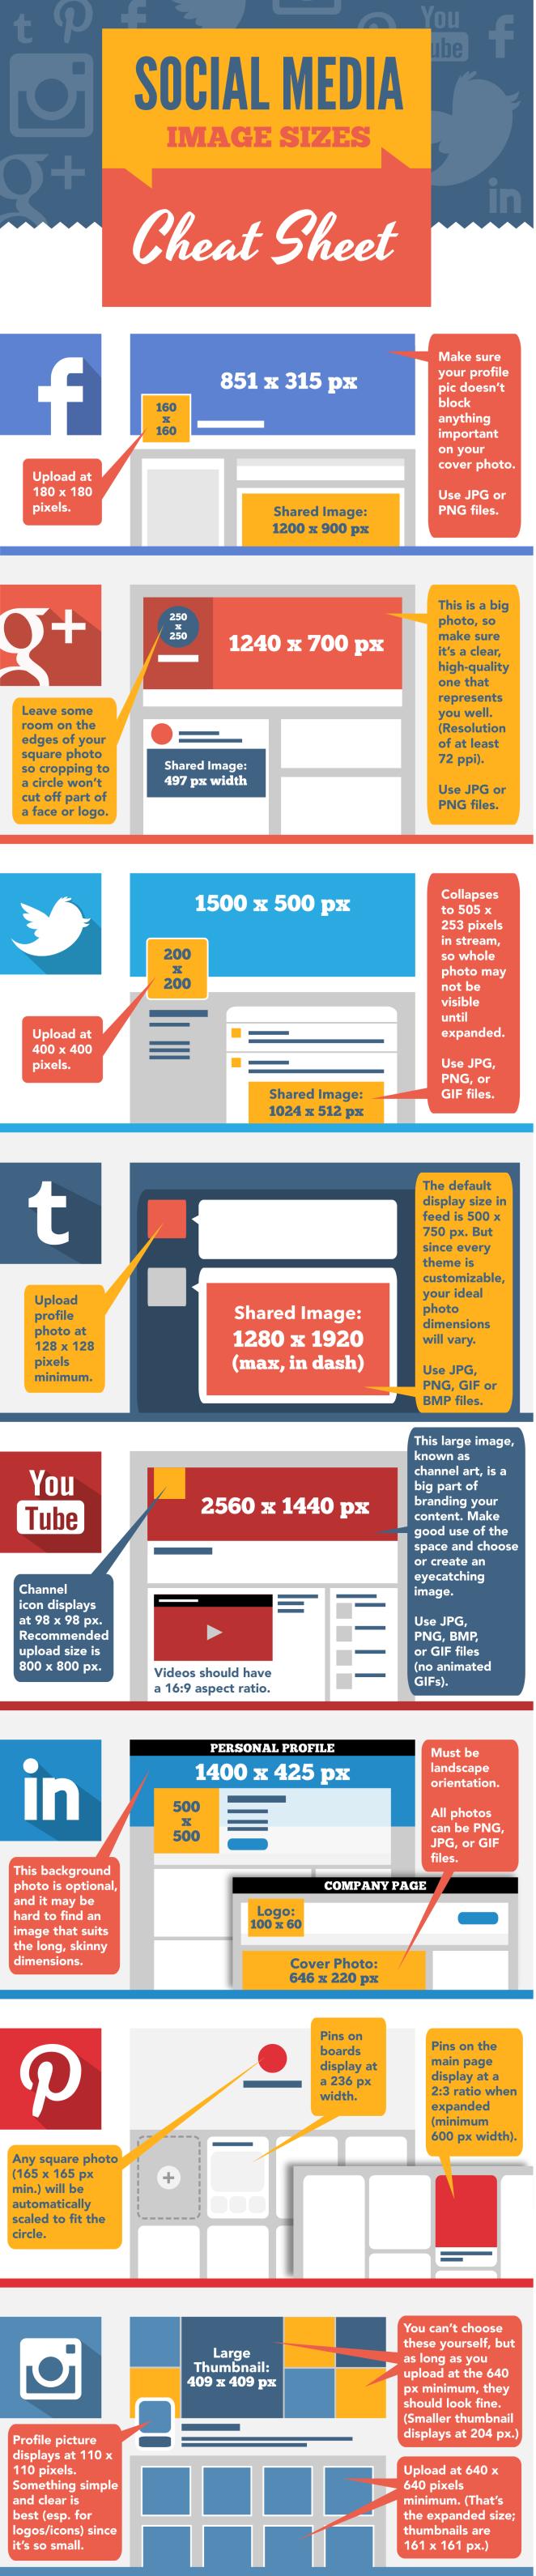 Canva_social-media-image-sizes-infographic-662x3181